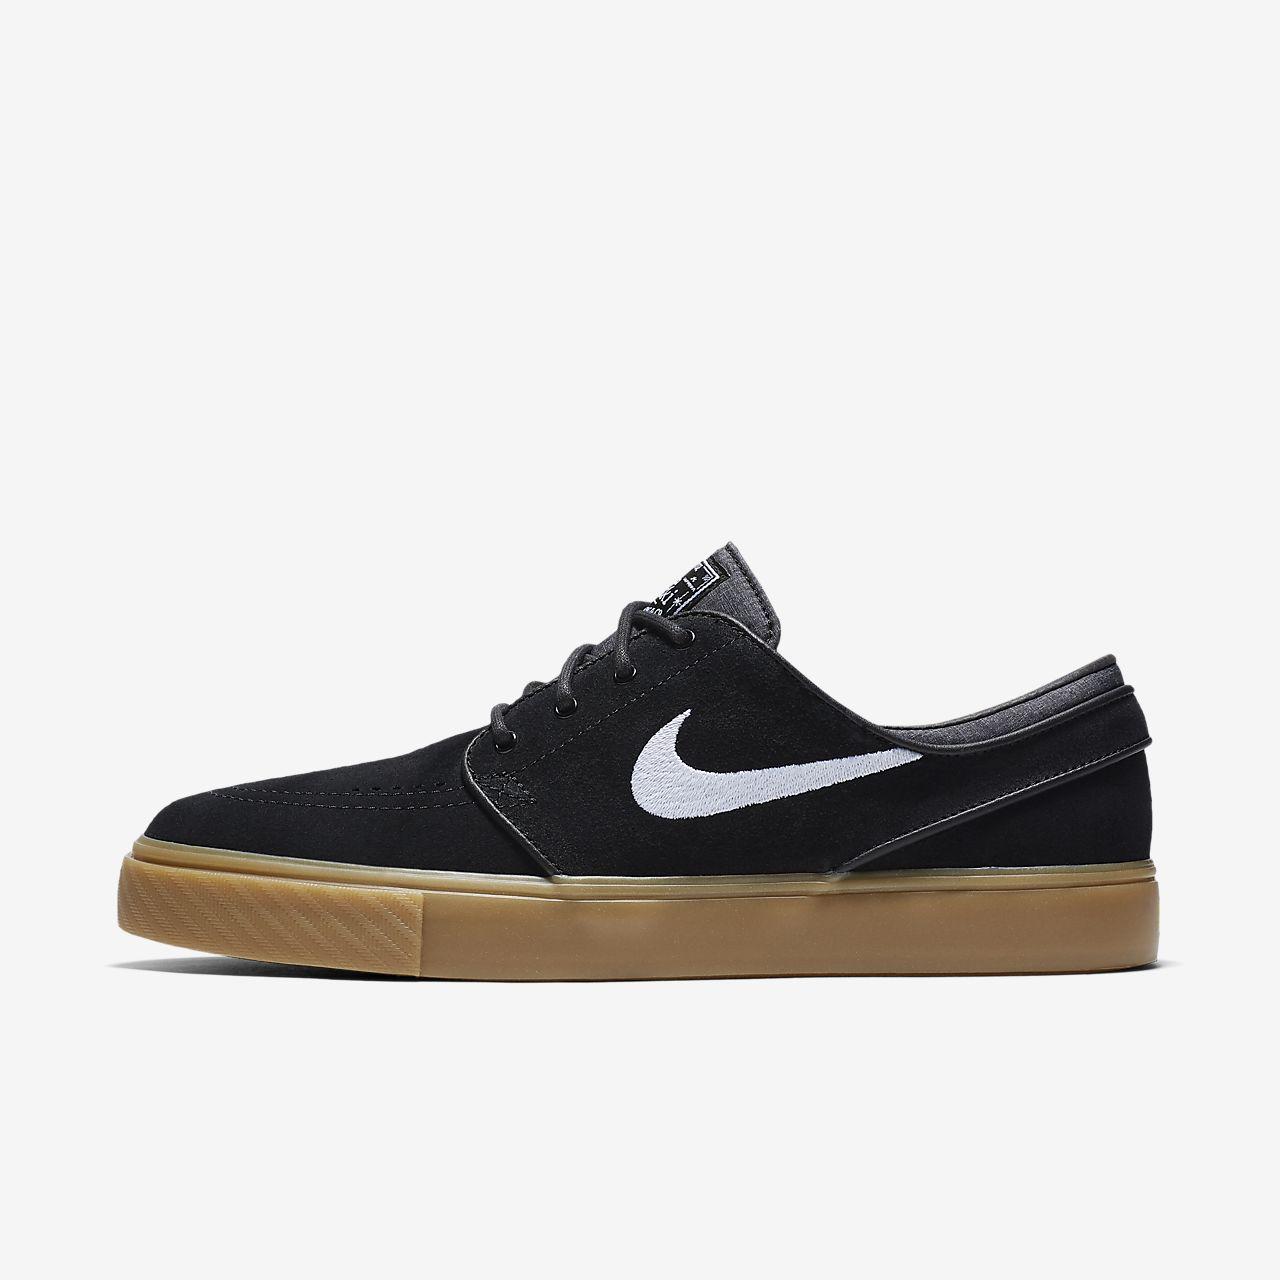 Nike SB Zoom Stefan Janoski (333824-021) Mens Skateboarding Shoes Black/White/Brown